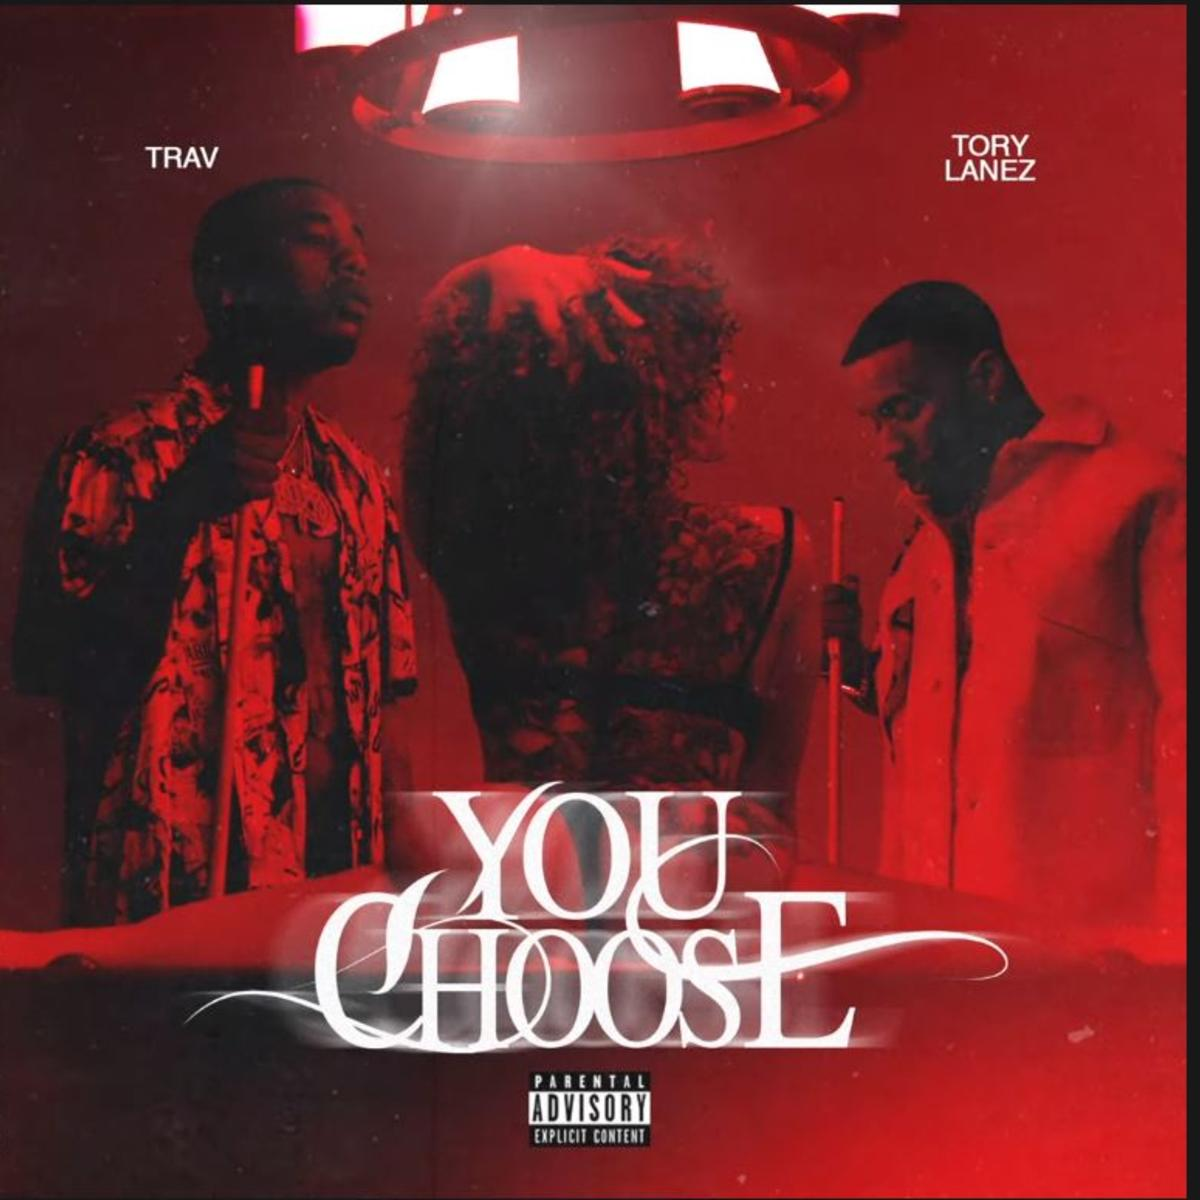 Trav - You Choose Feat. Tory Lanez